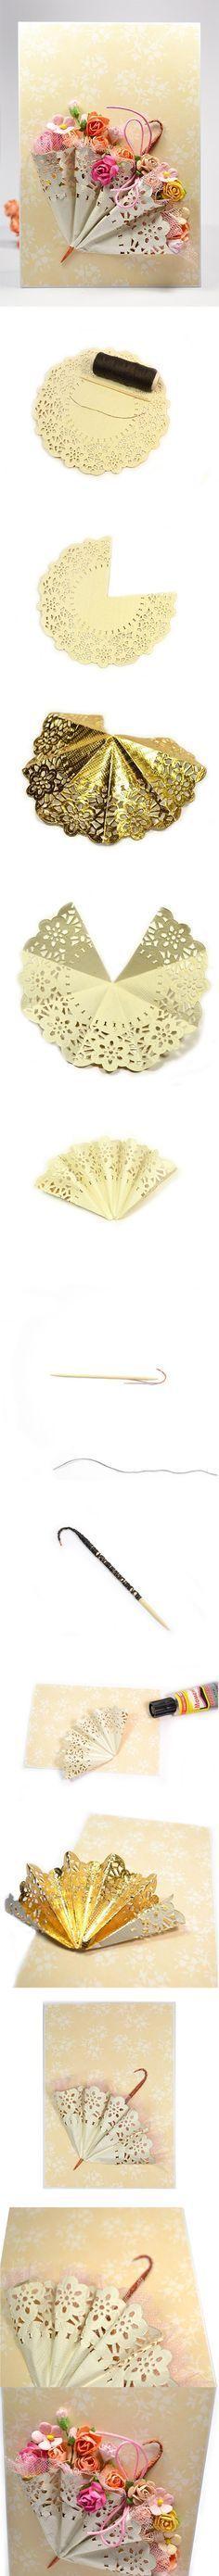 DIY Cute Mini Umbrella with Paper Doily. http://www.fabartdiy.com/diy-cute-mini-umbrella-with-paper-doily/